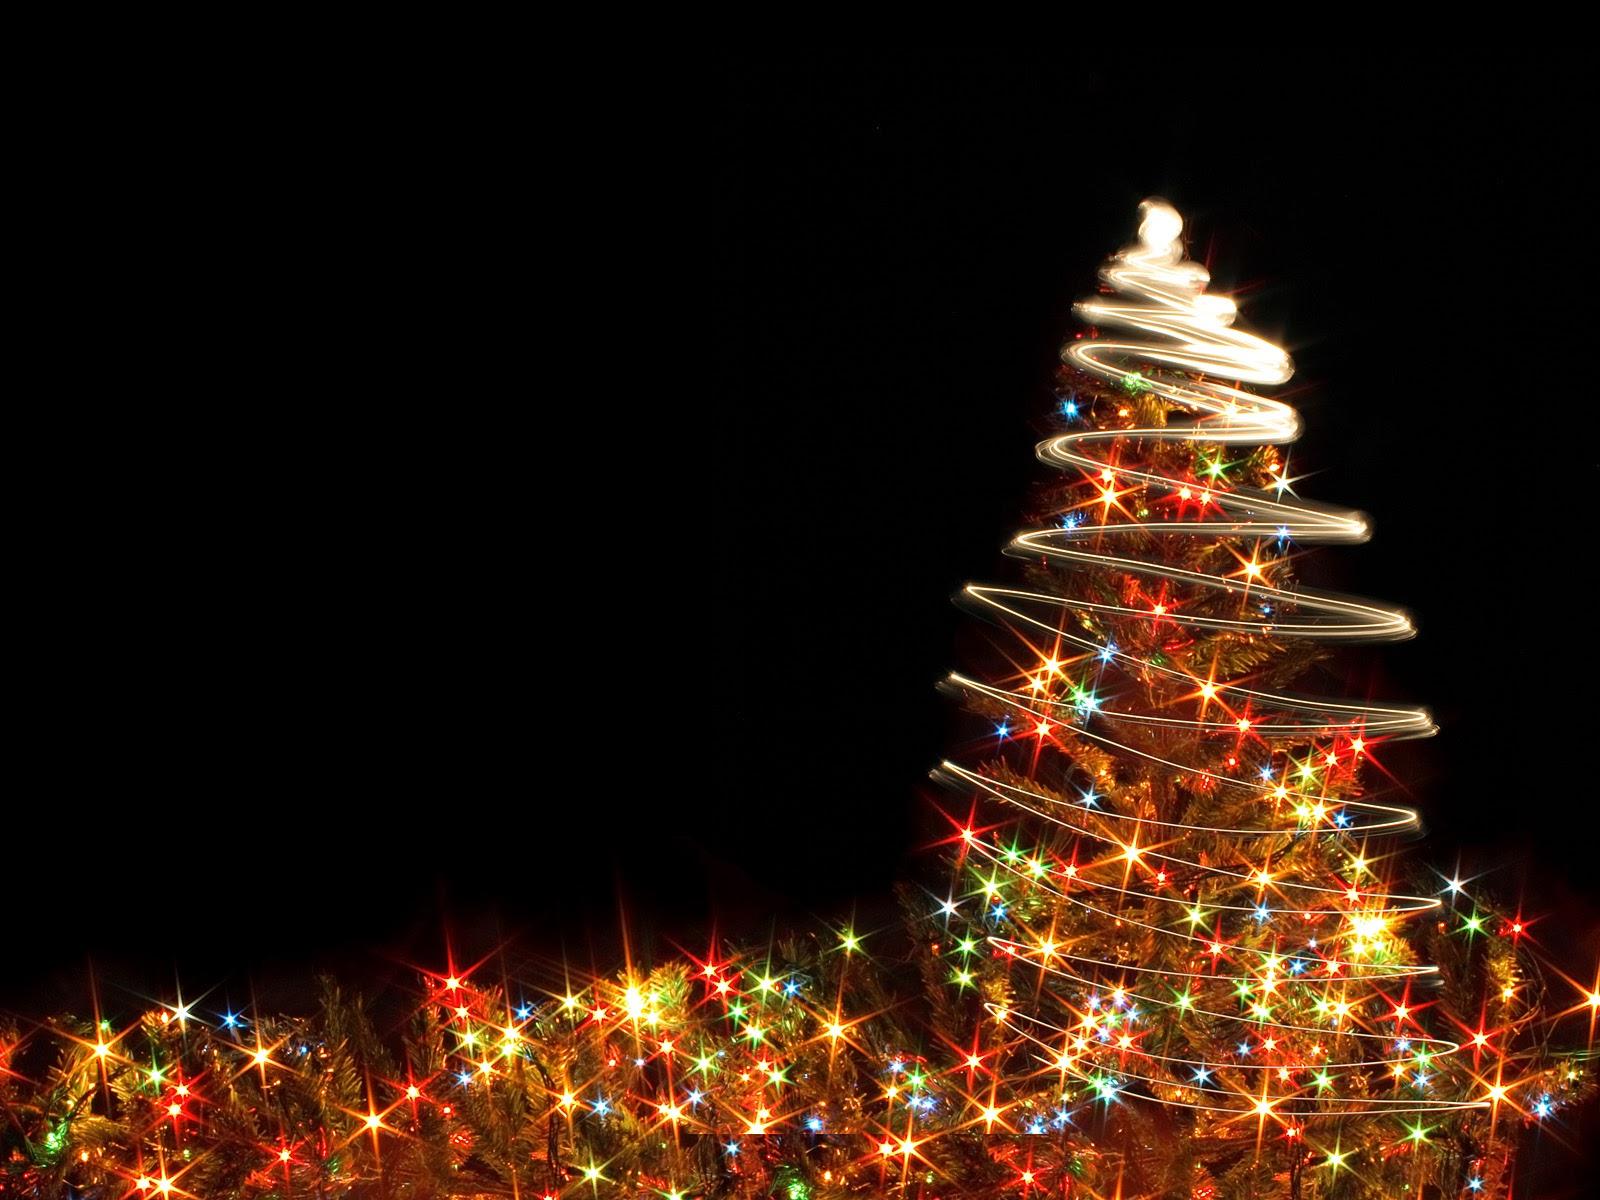 All 4u HD Wallpaper Free Download : Christmas Tree